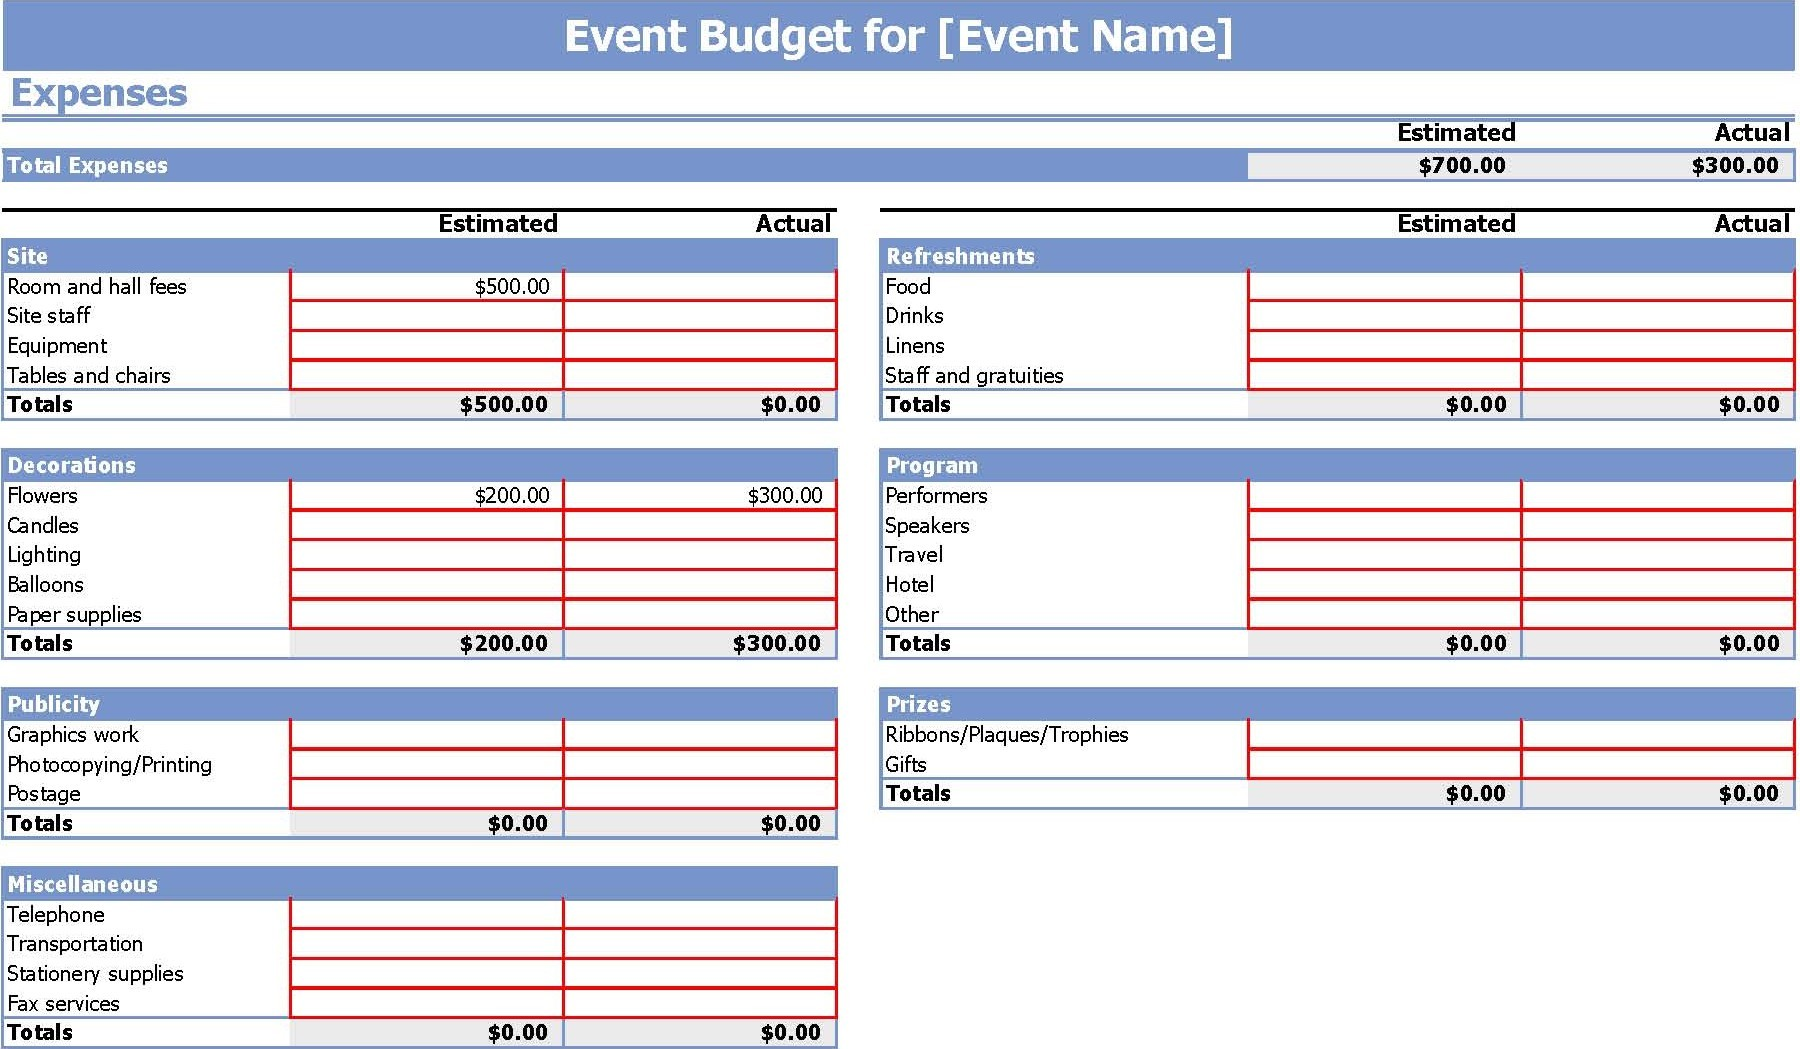 event budget template xls  Event Budget Template Xls | budget template free - event budget template xls